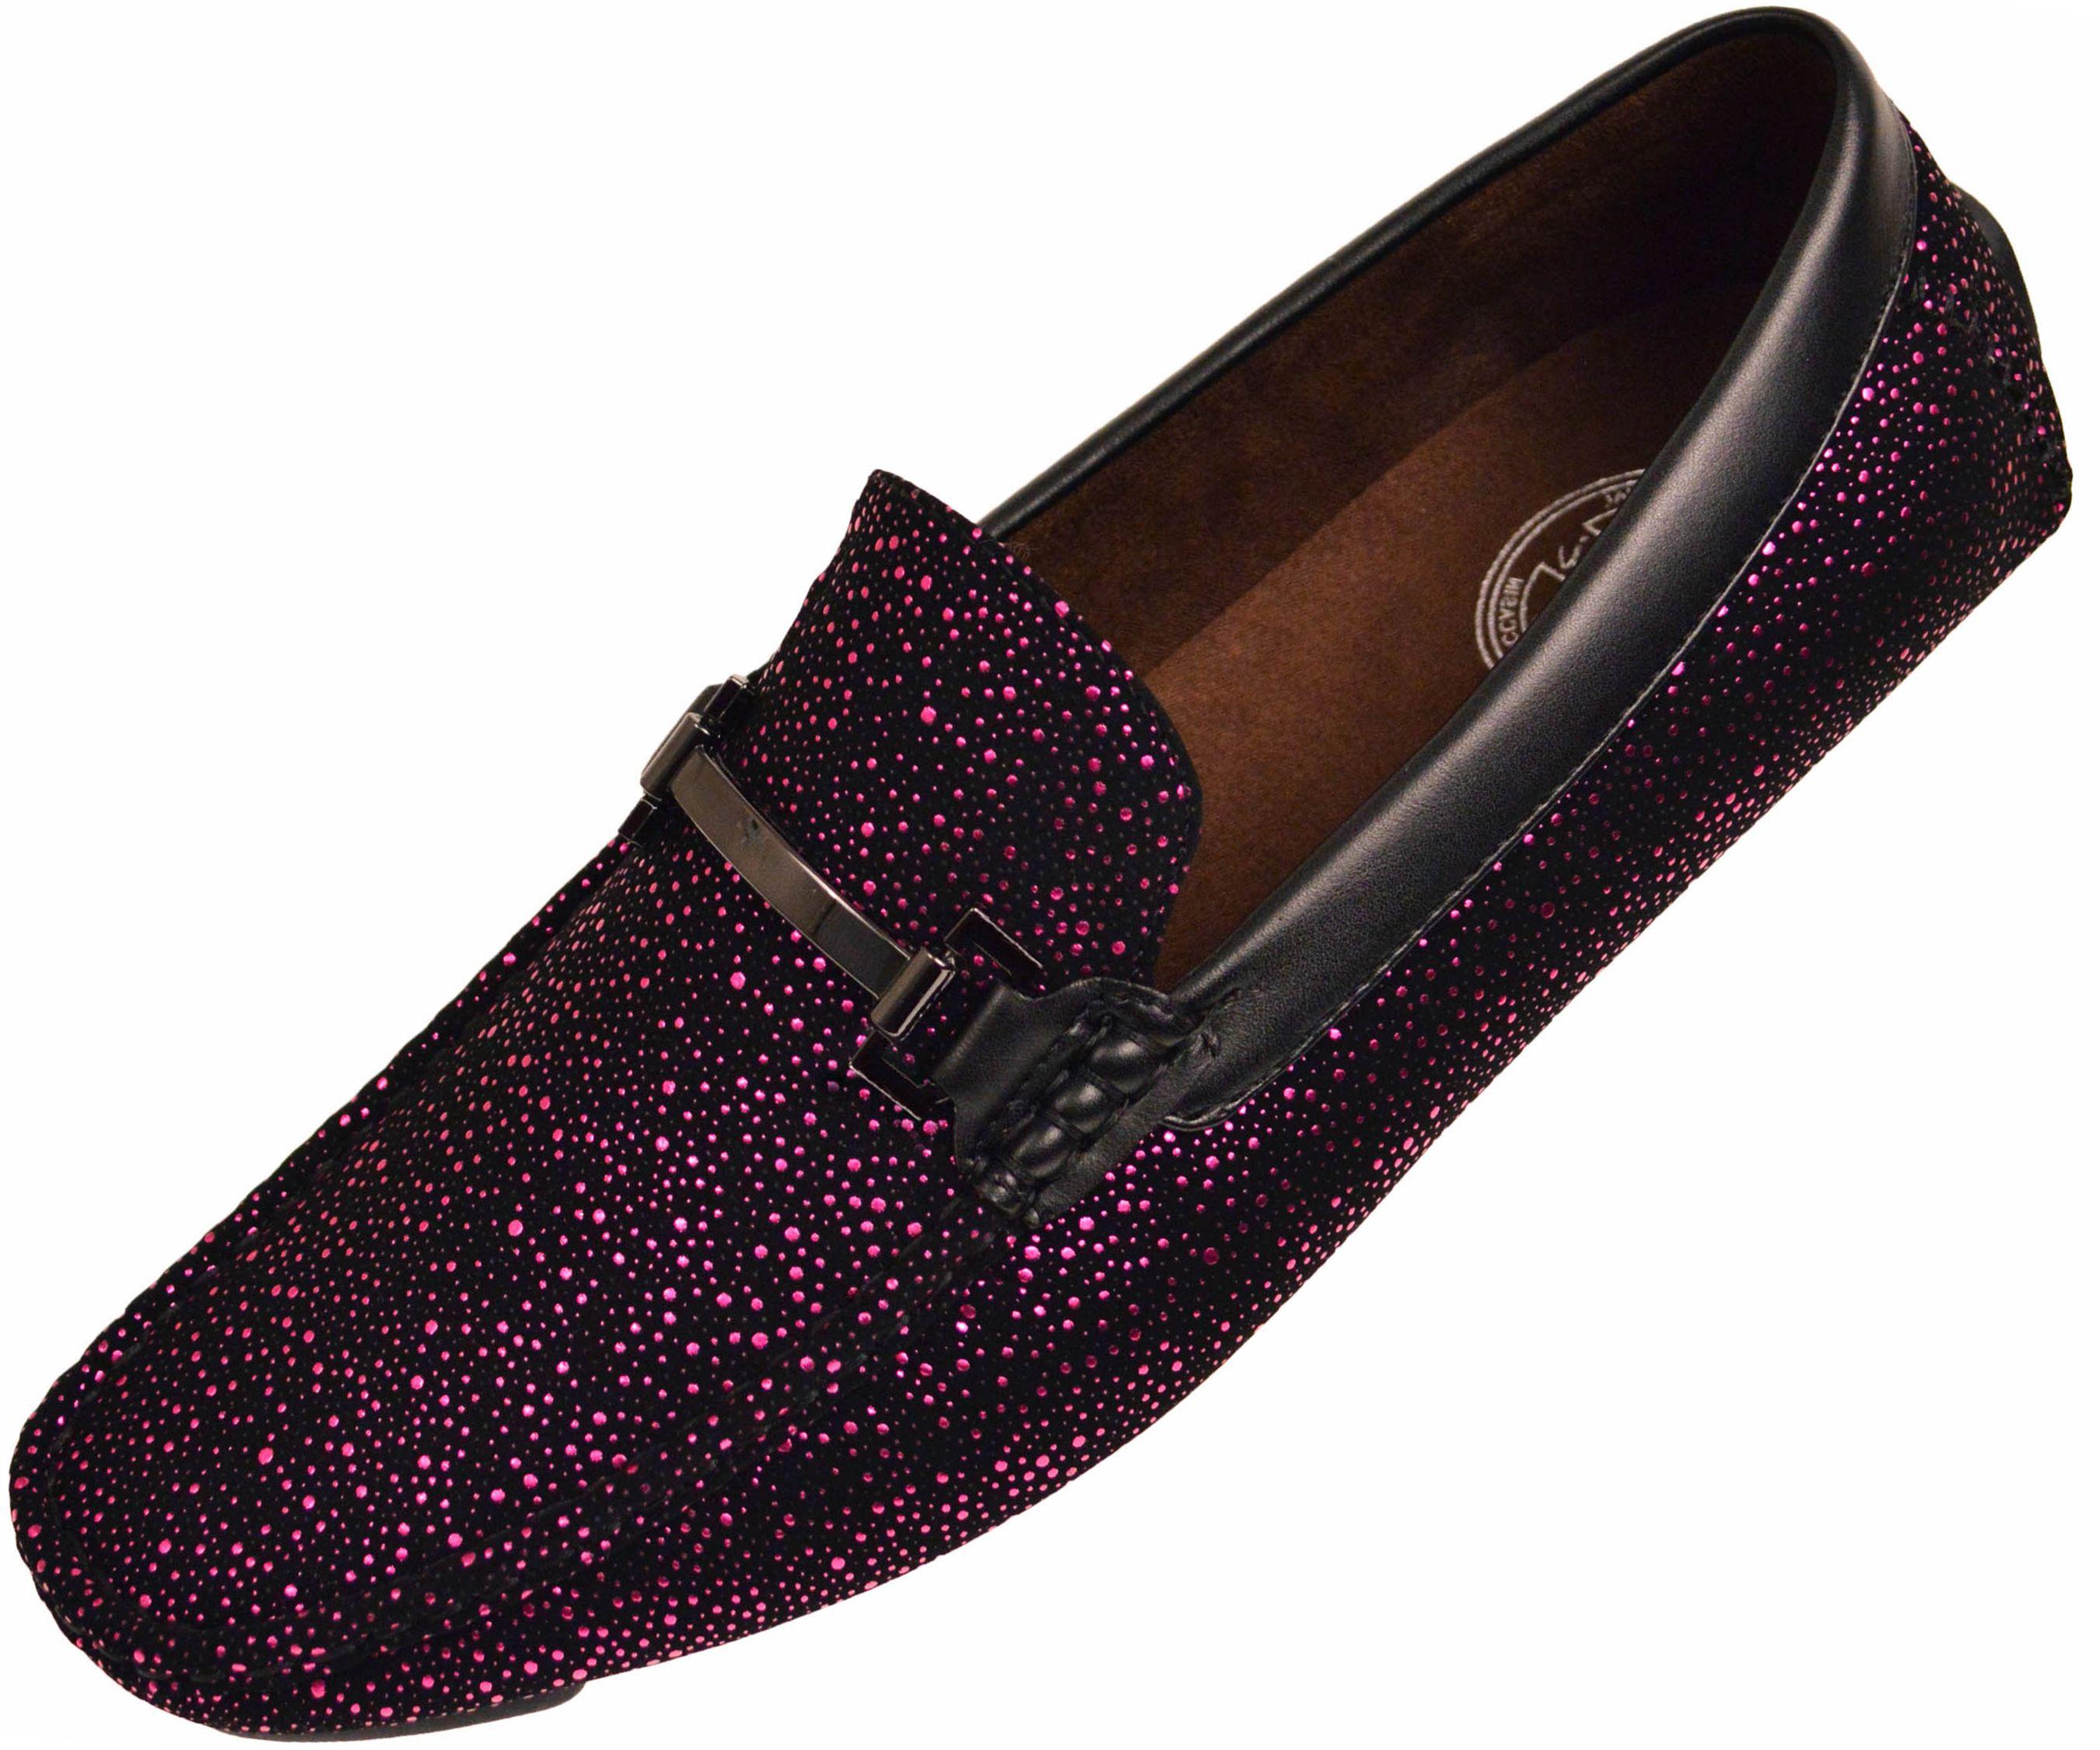 Men's Gold Tone Metallic Detail Formal Driving Loafers